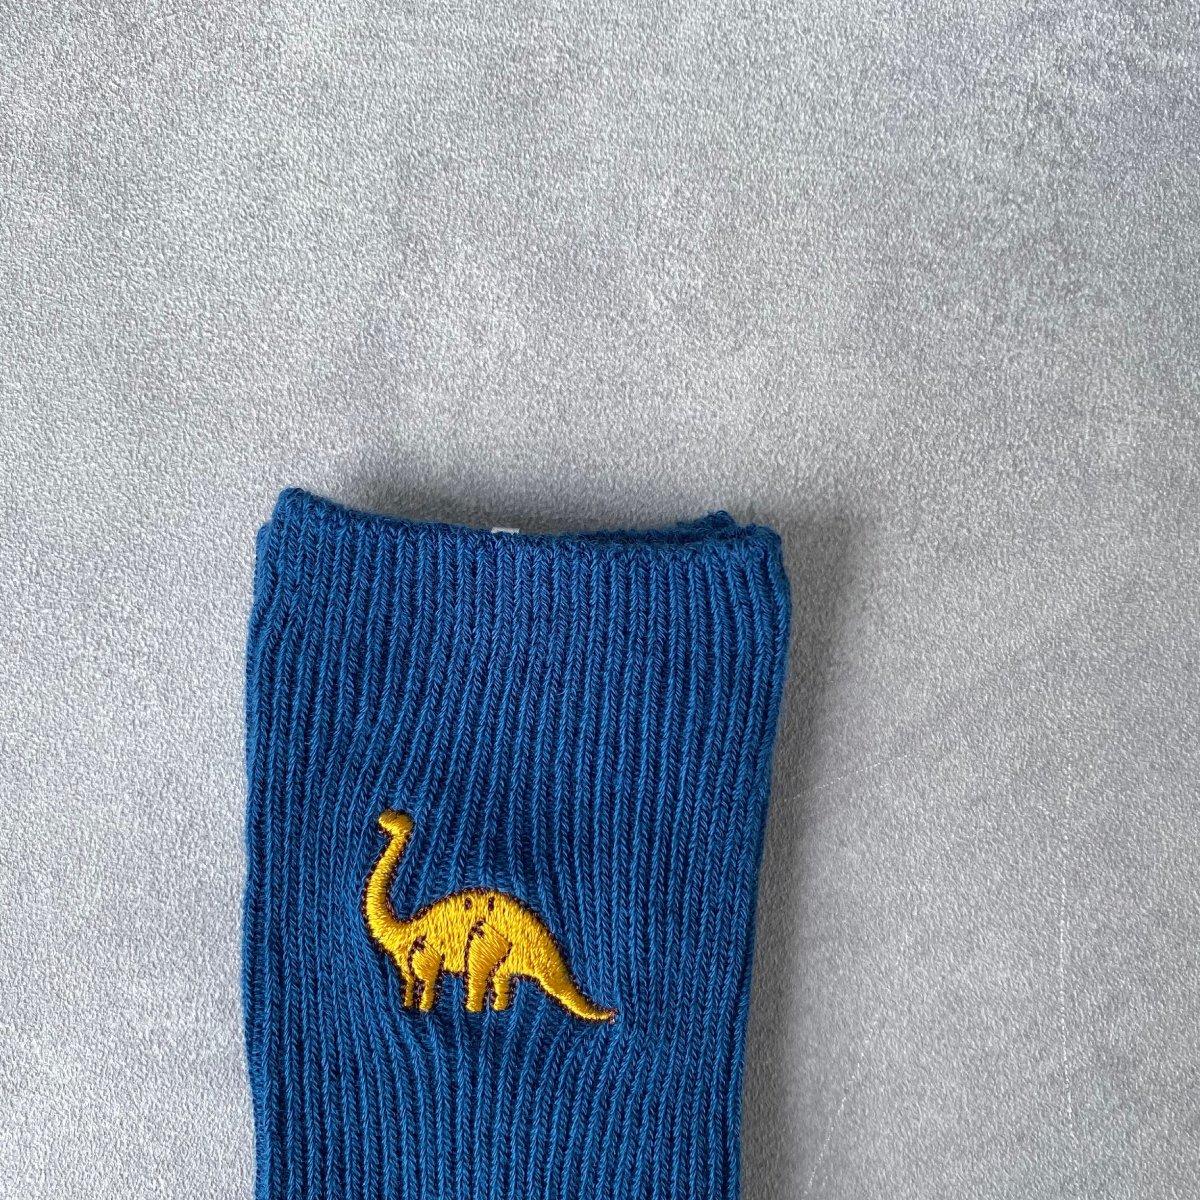 【KIDS】Dino Socks 詳細画像8